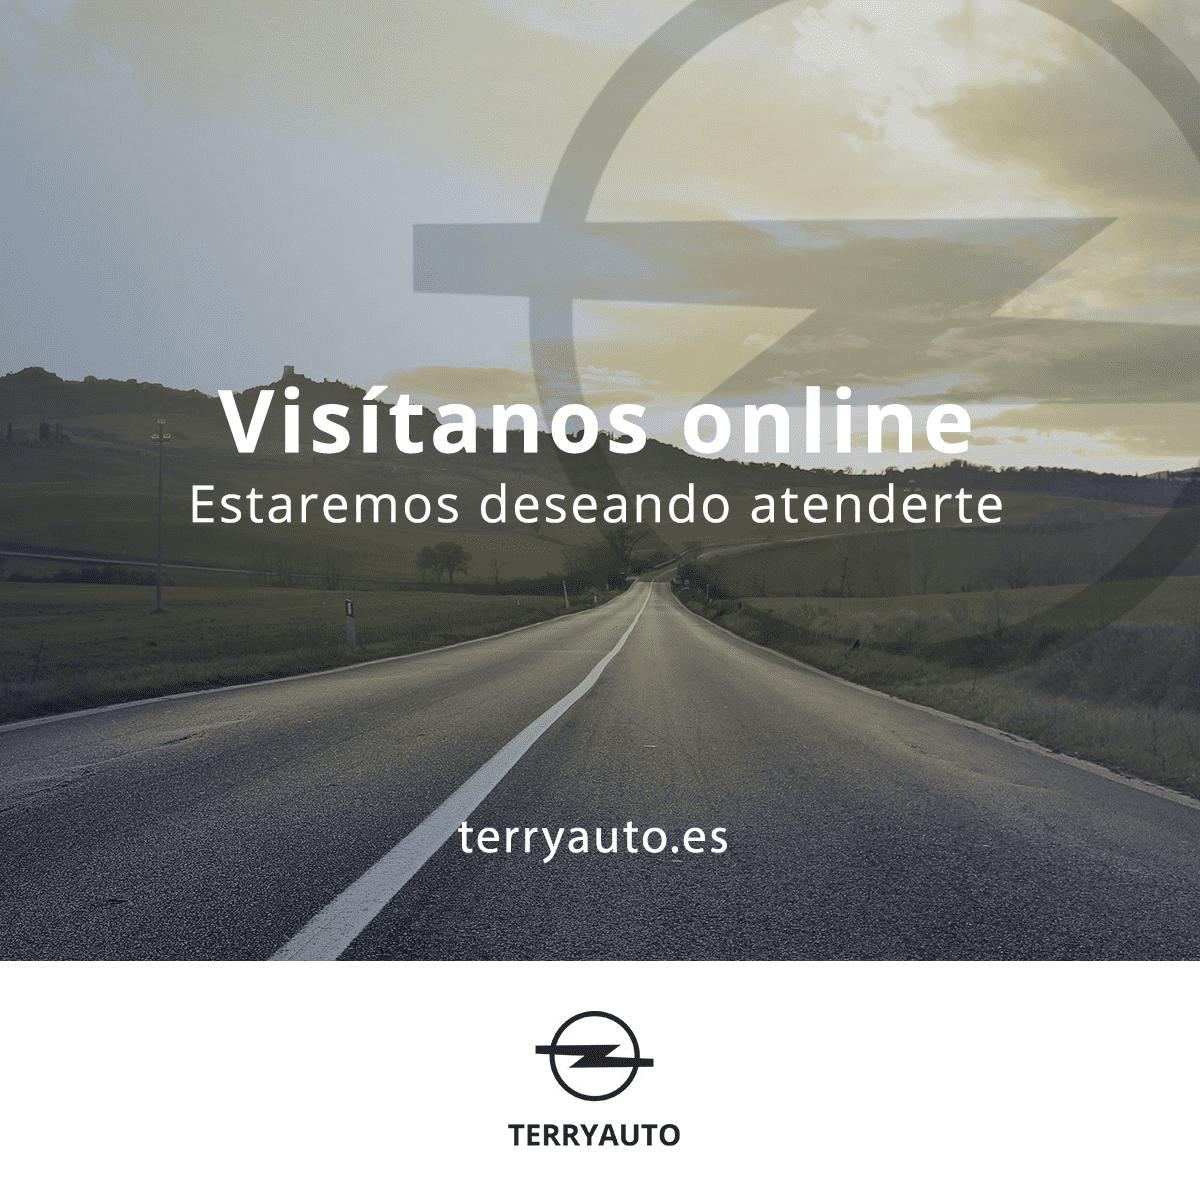 Visítanos online